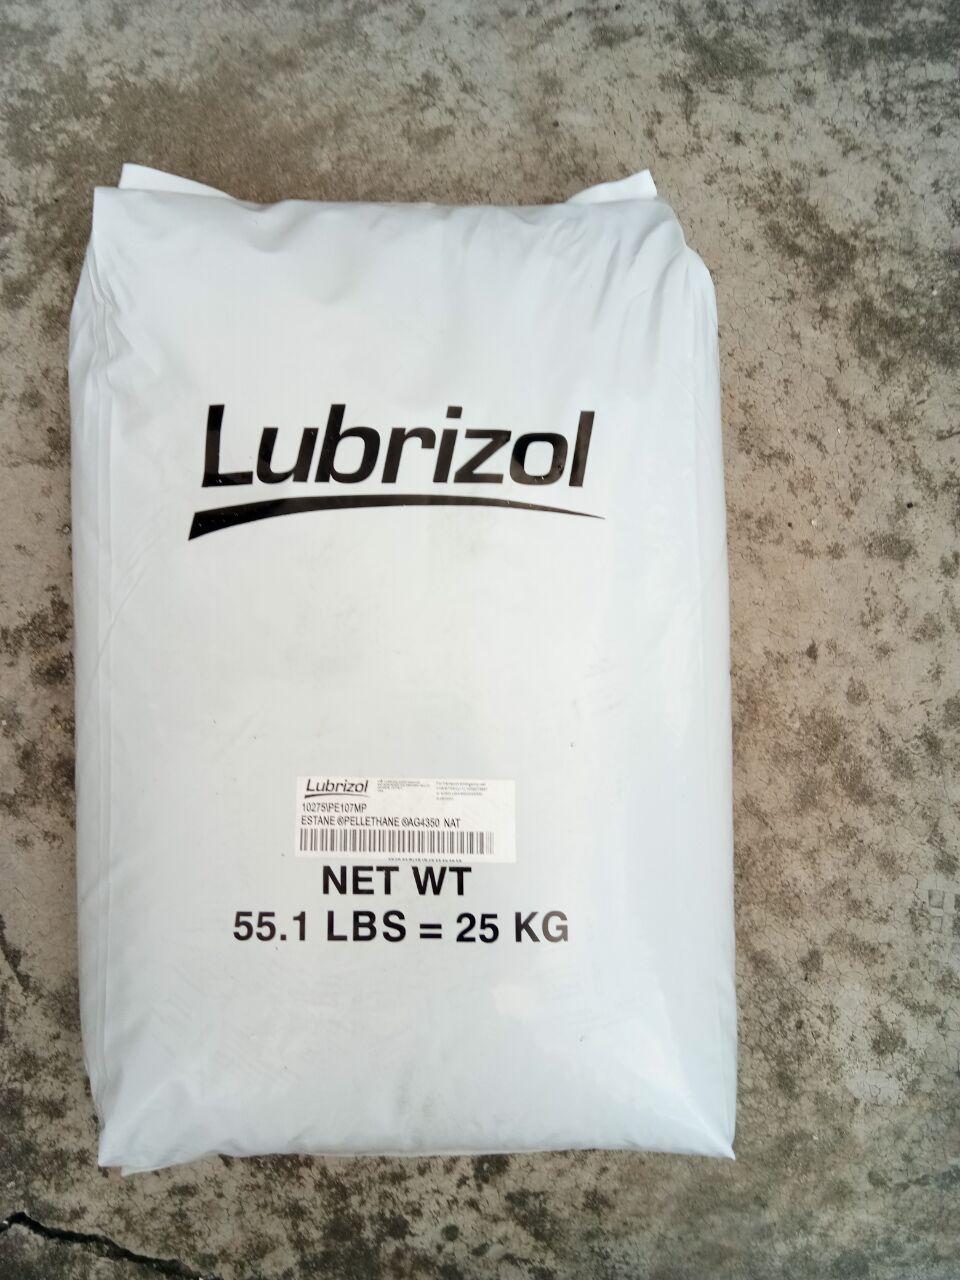 ESTANE® 58130 Lubrizol Advanced TPU-聚脂-东莞市崀峰塑胶原料有限公司